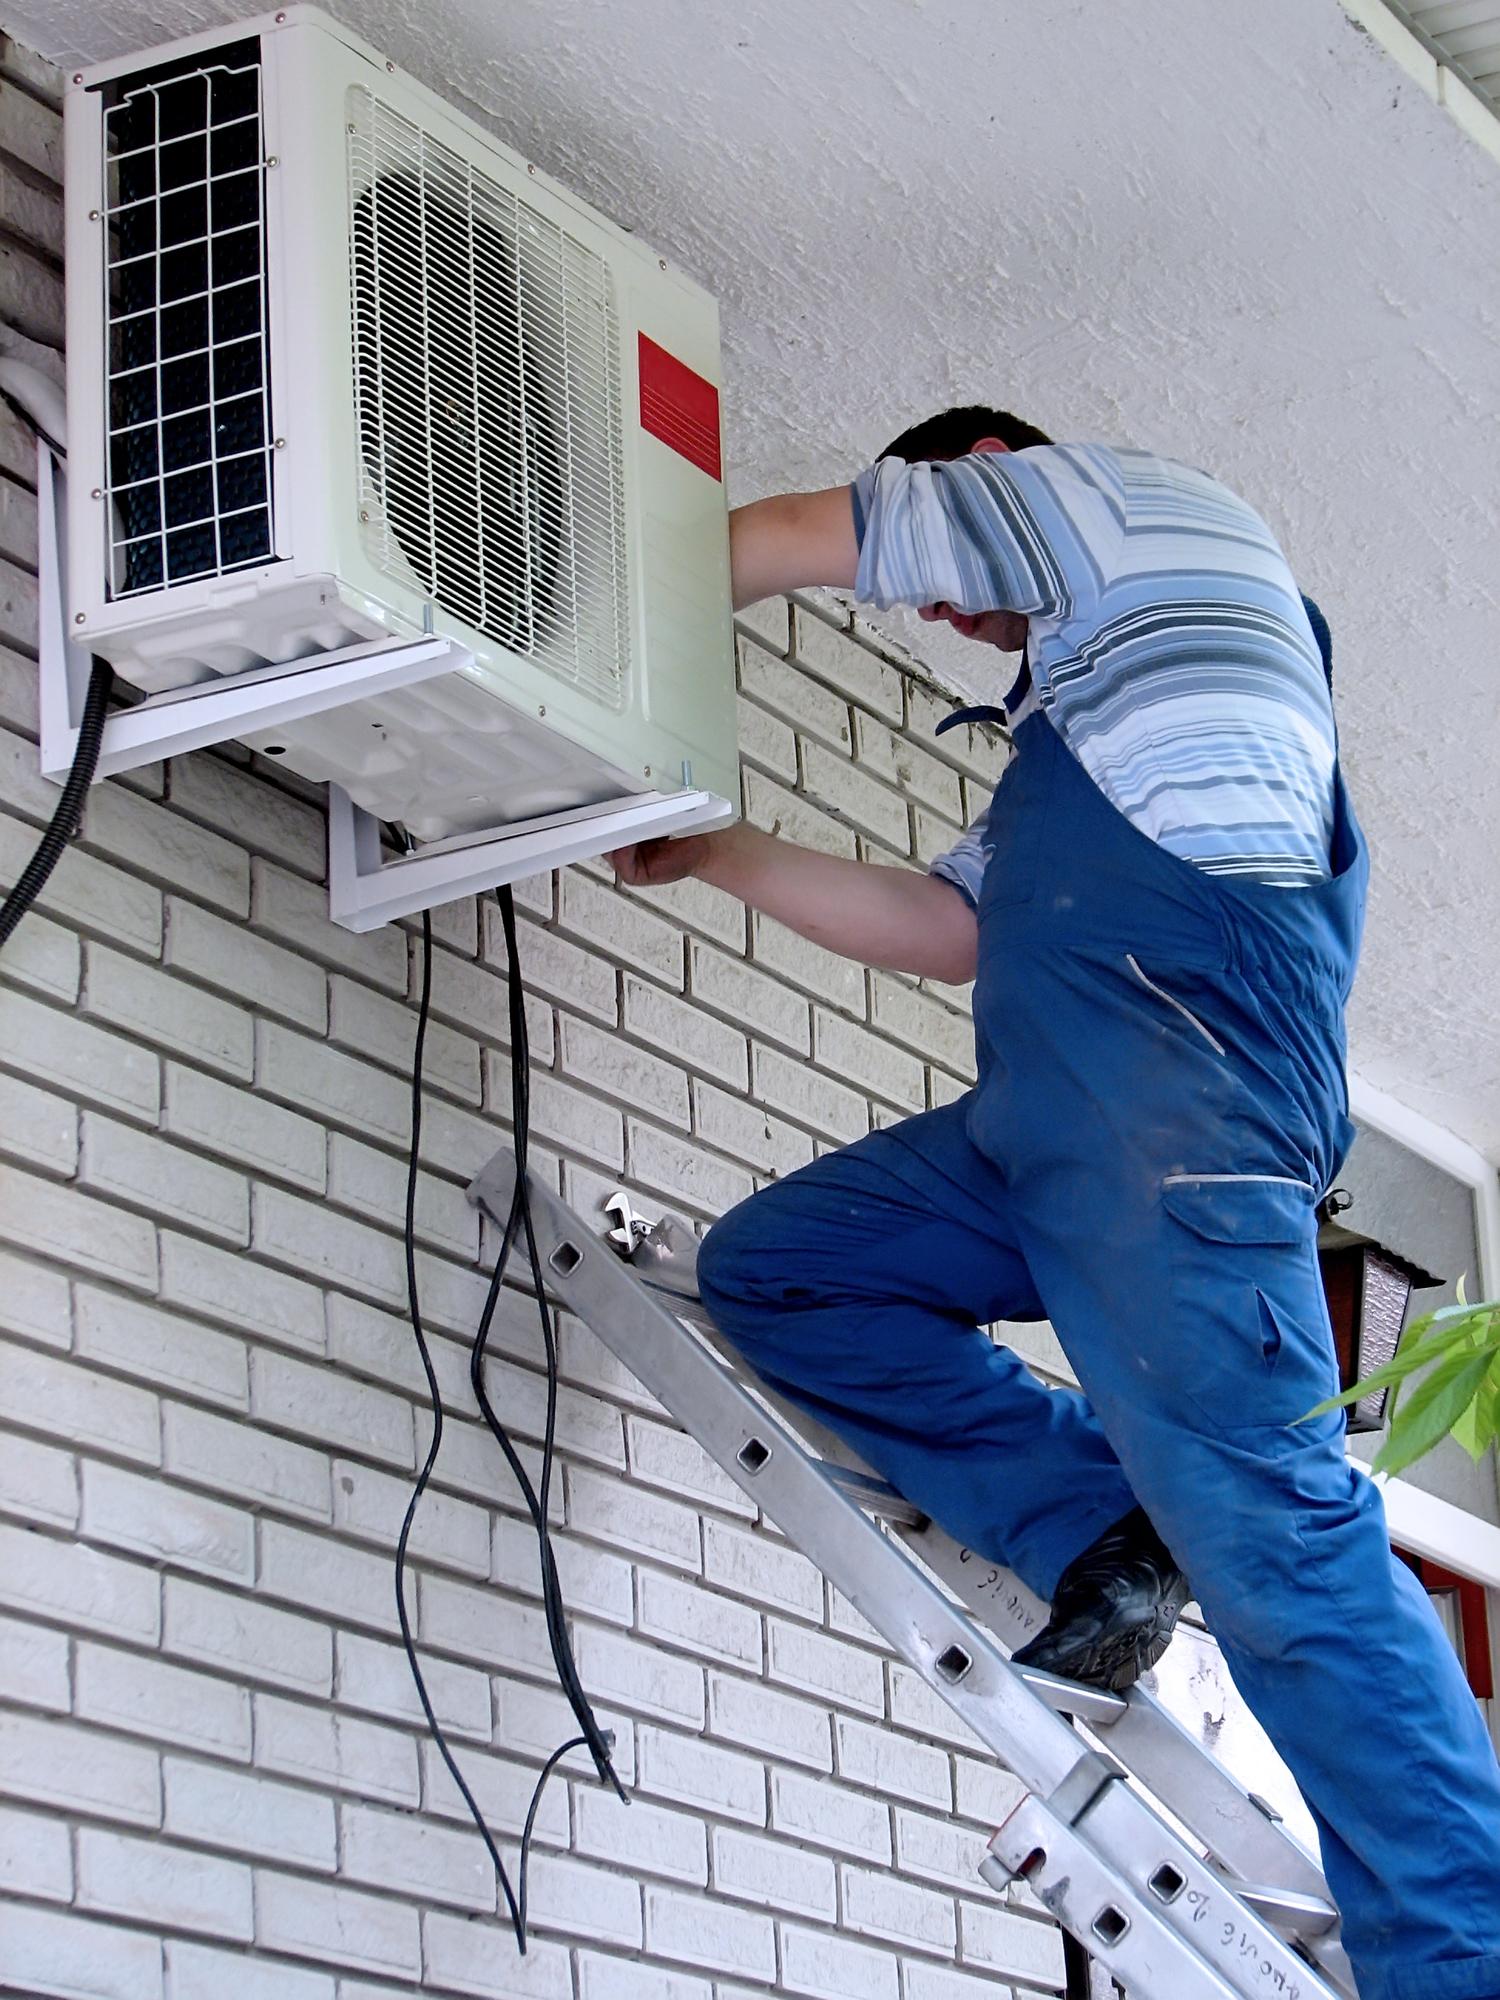 Air conditionar repair